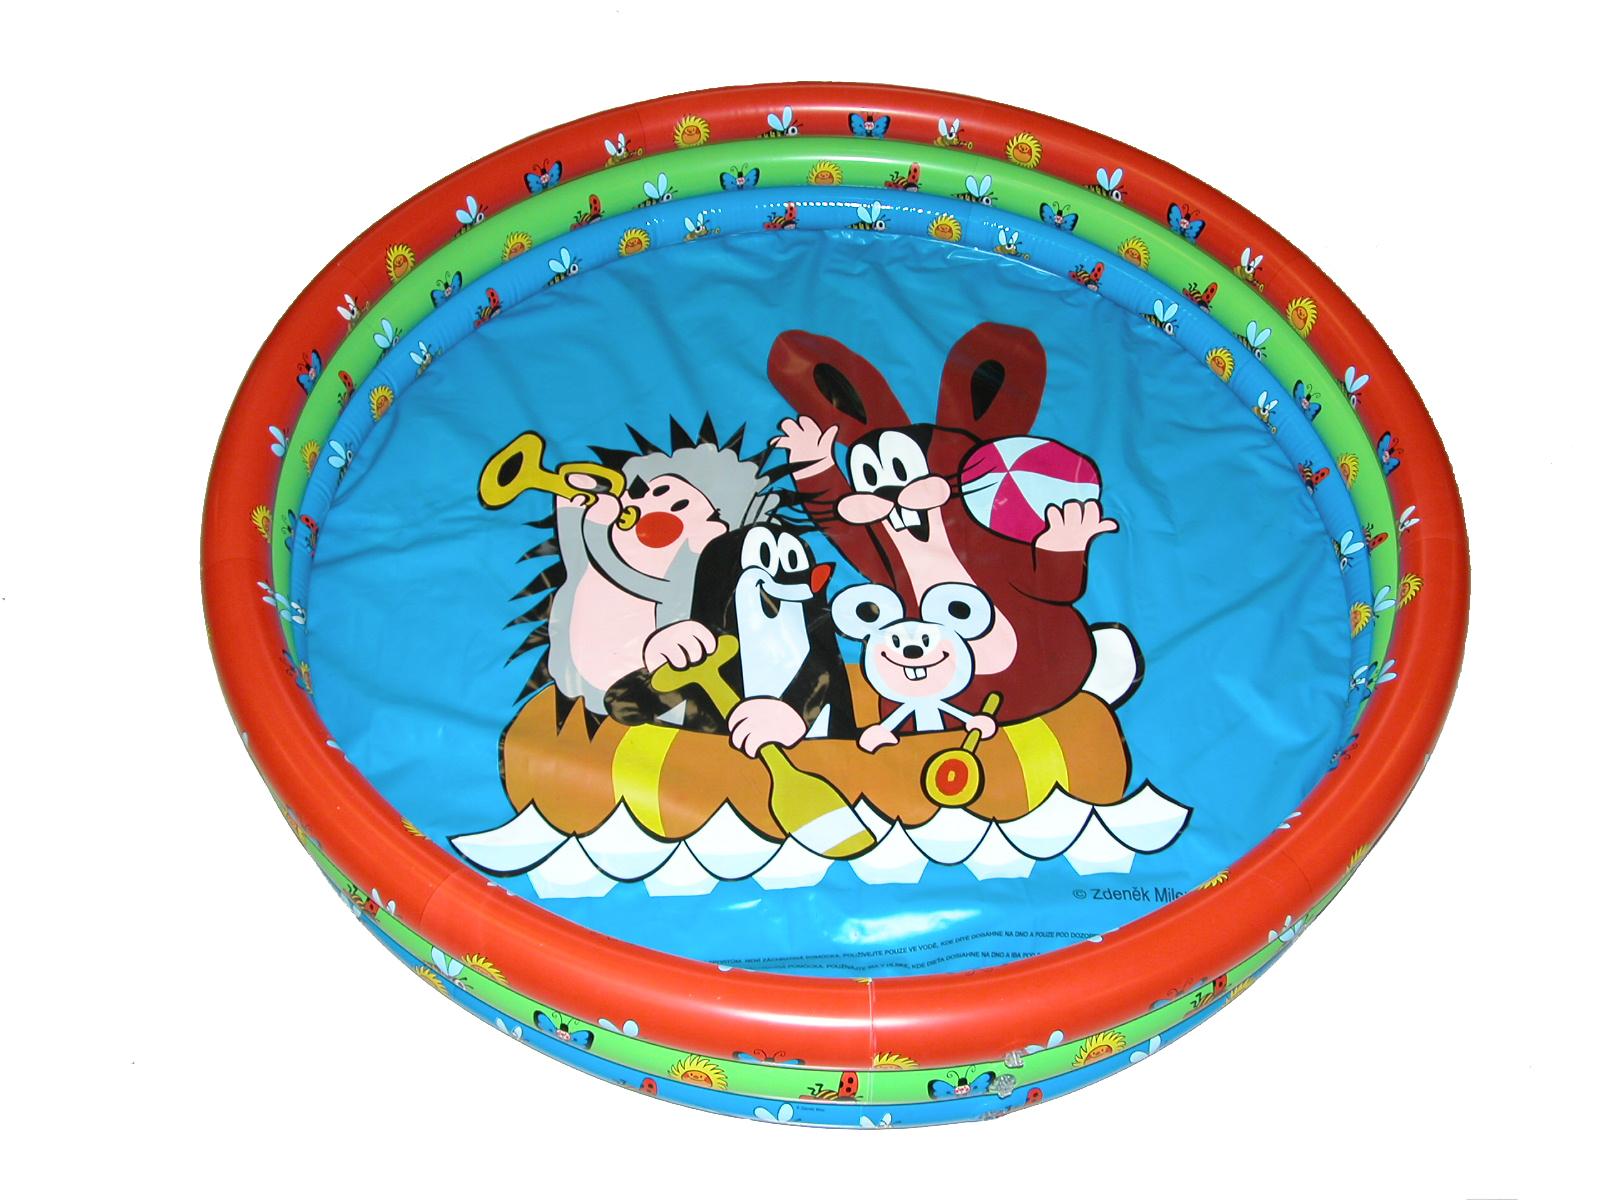 Bazén dětský Krtek 102x25 cm